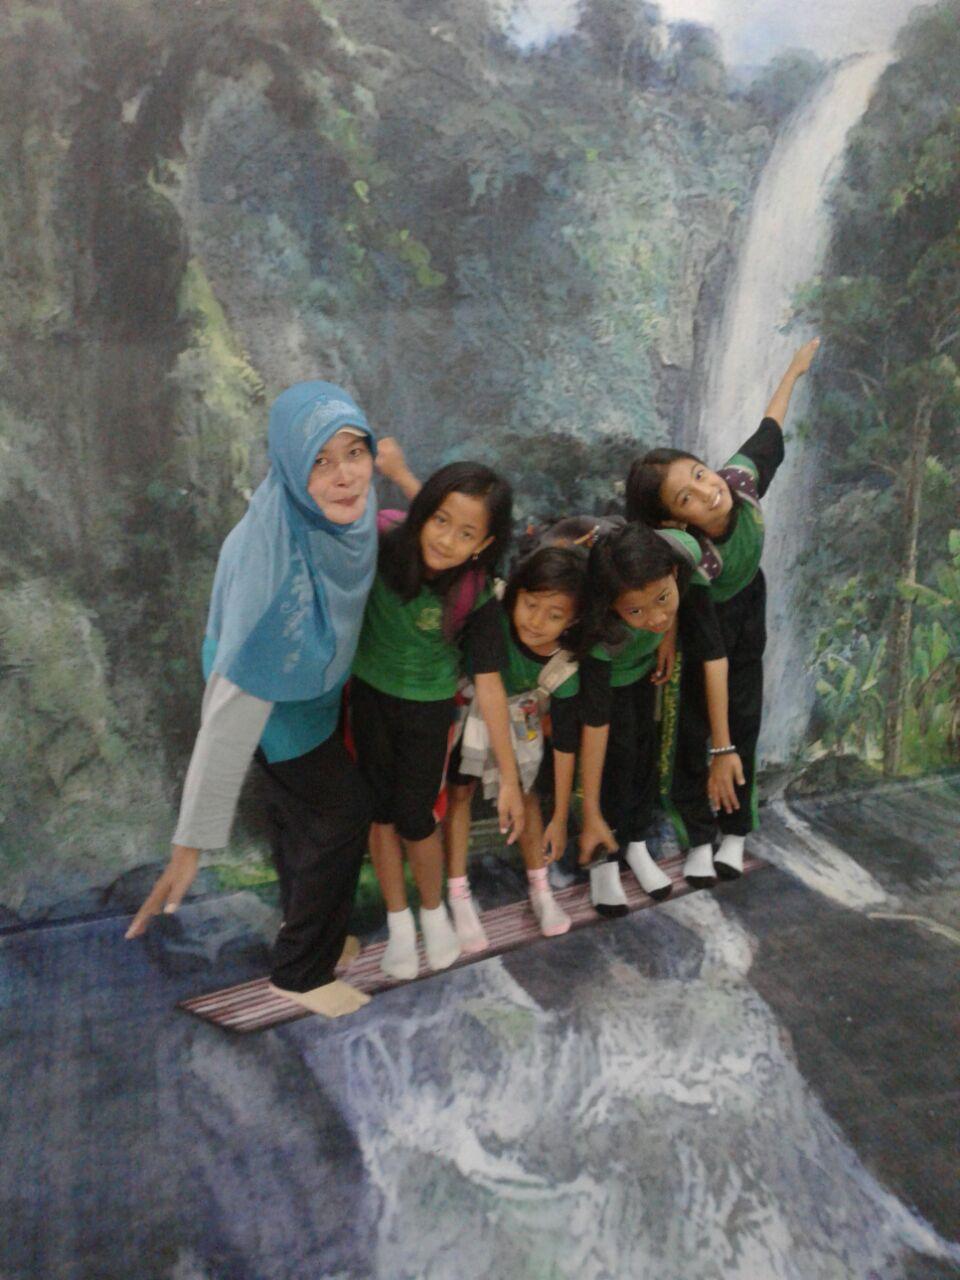 Yukk Rumah Kamera Info Borobudur Wisata Magelang Desa Majaksingi Kecamatan